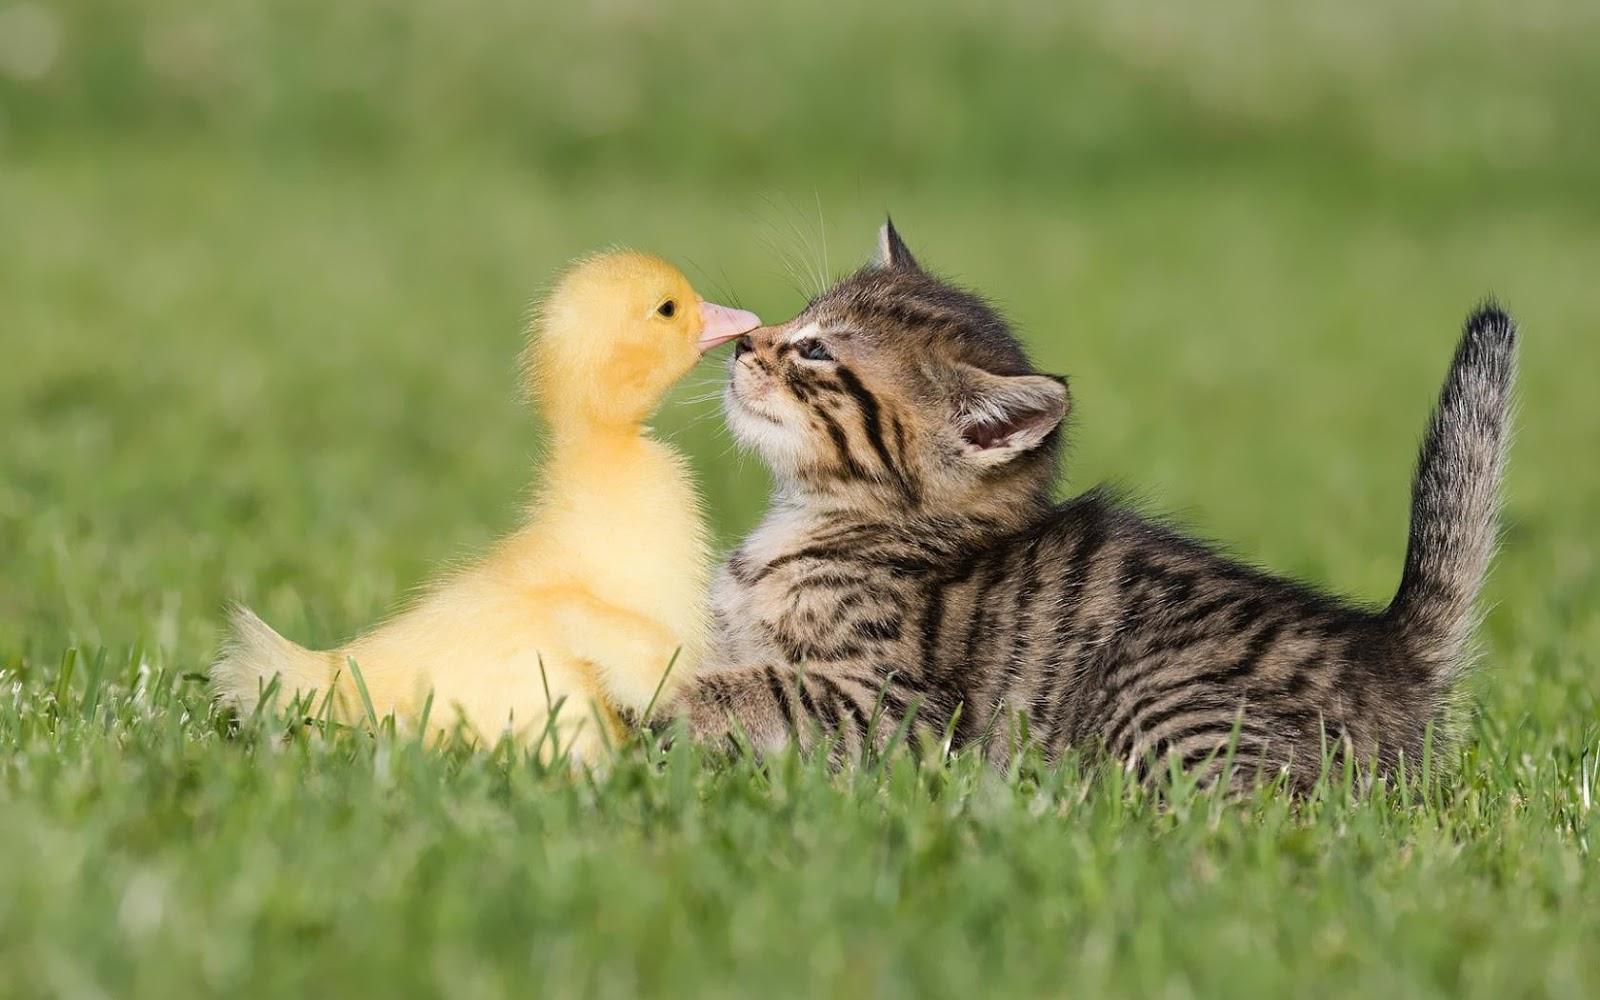 Cute Funny Animal Hd Backgrounds 1600x1000 pixel Popular HD 1600x1000